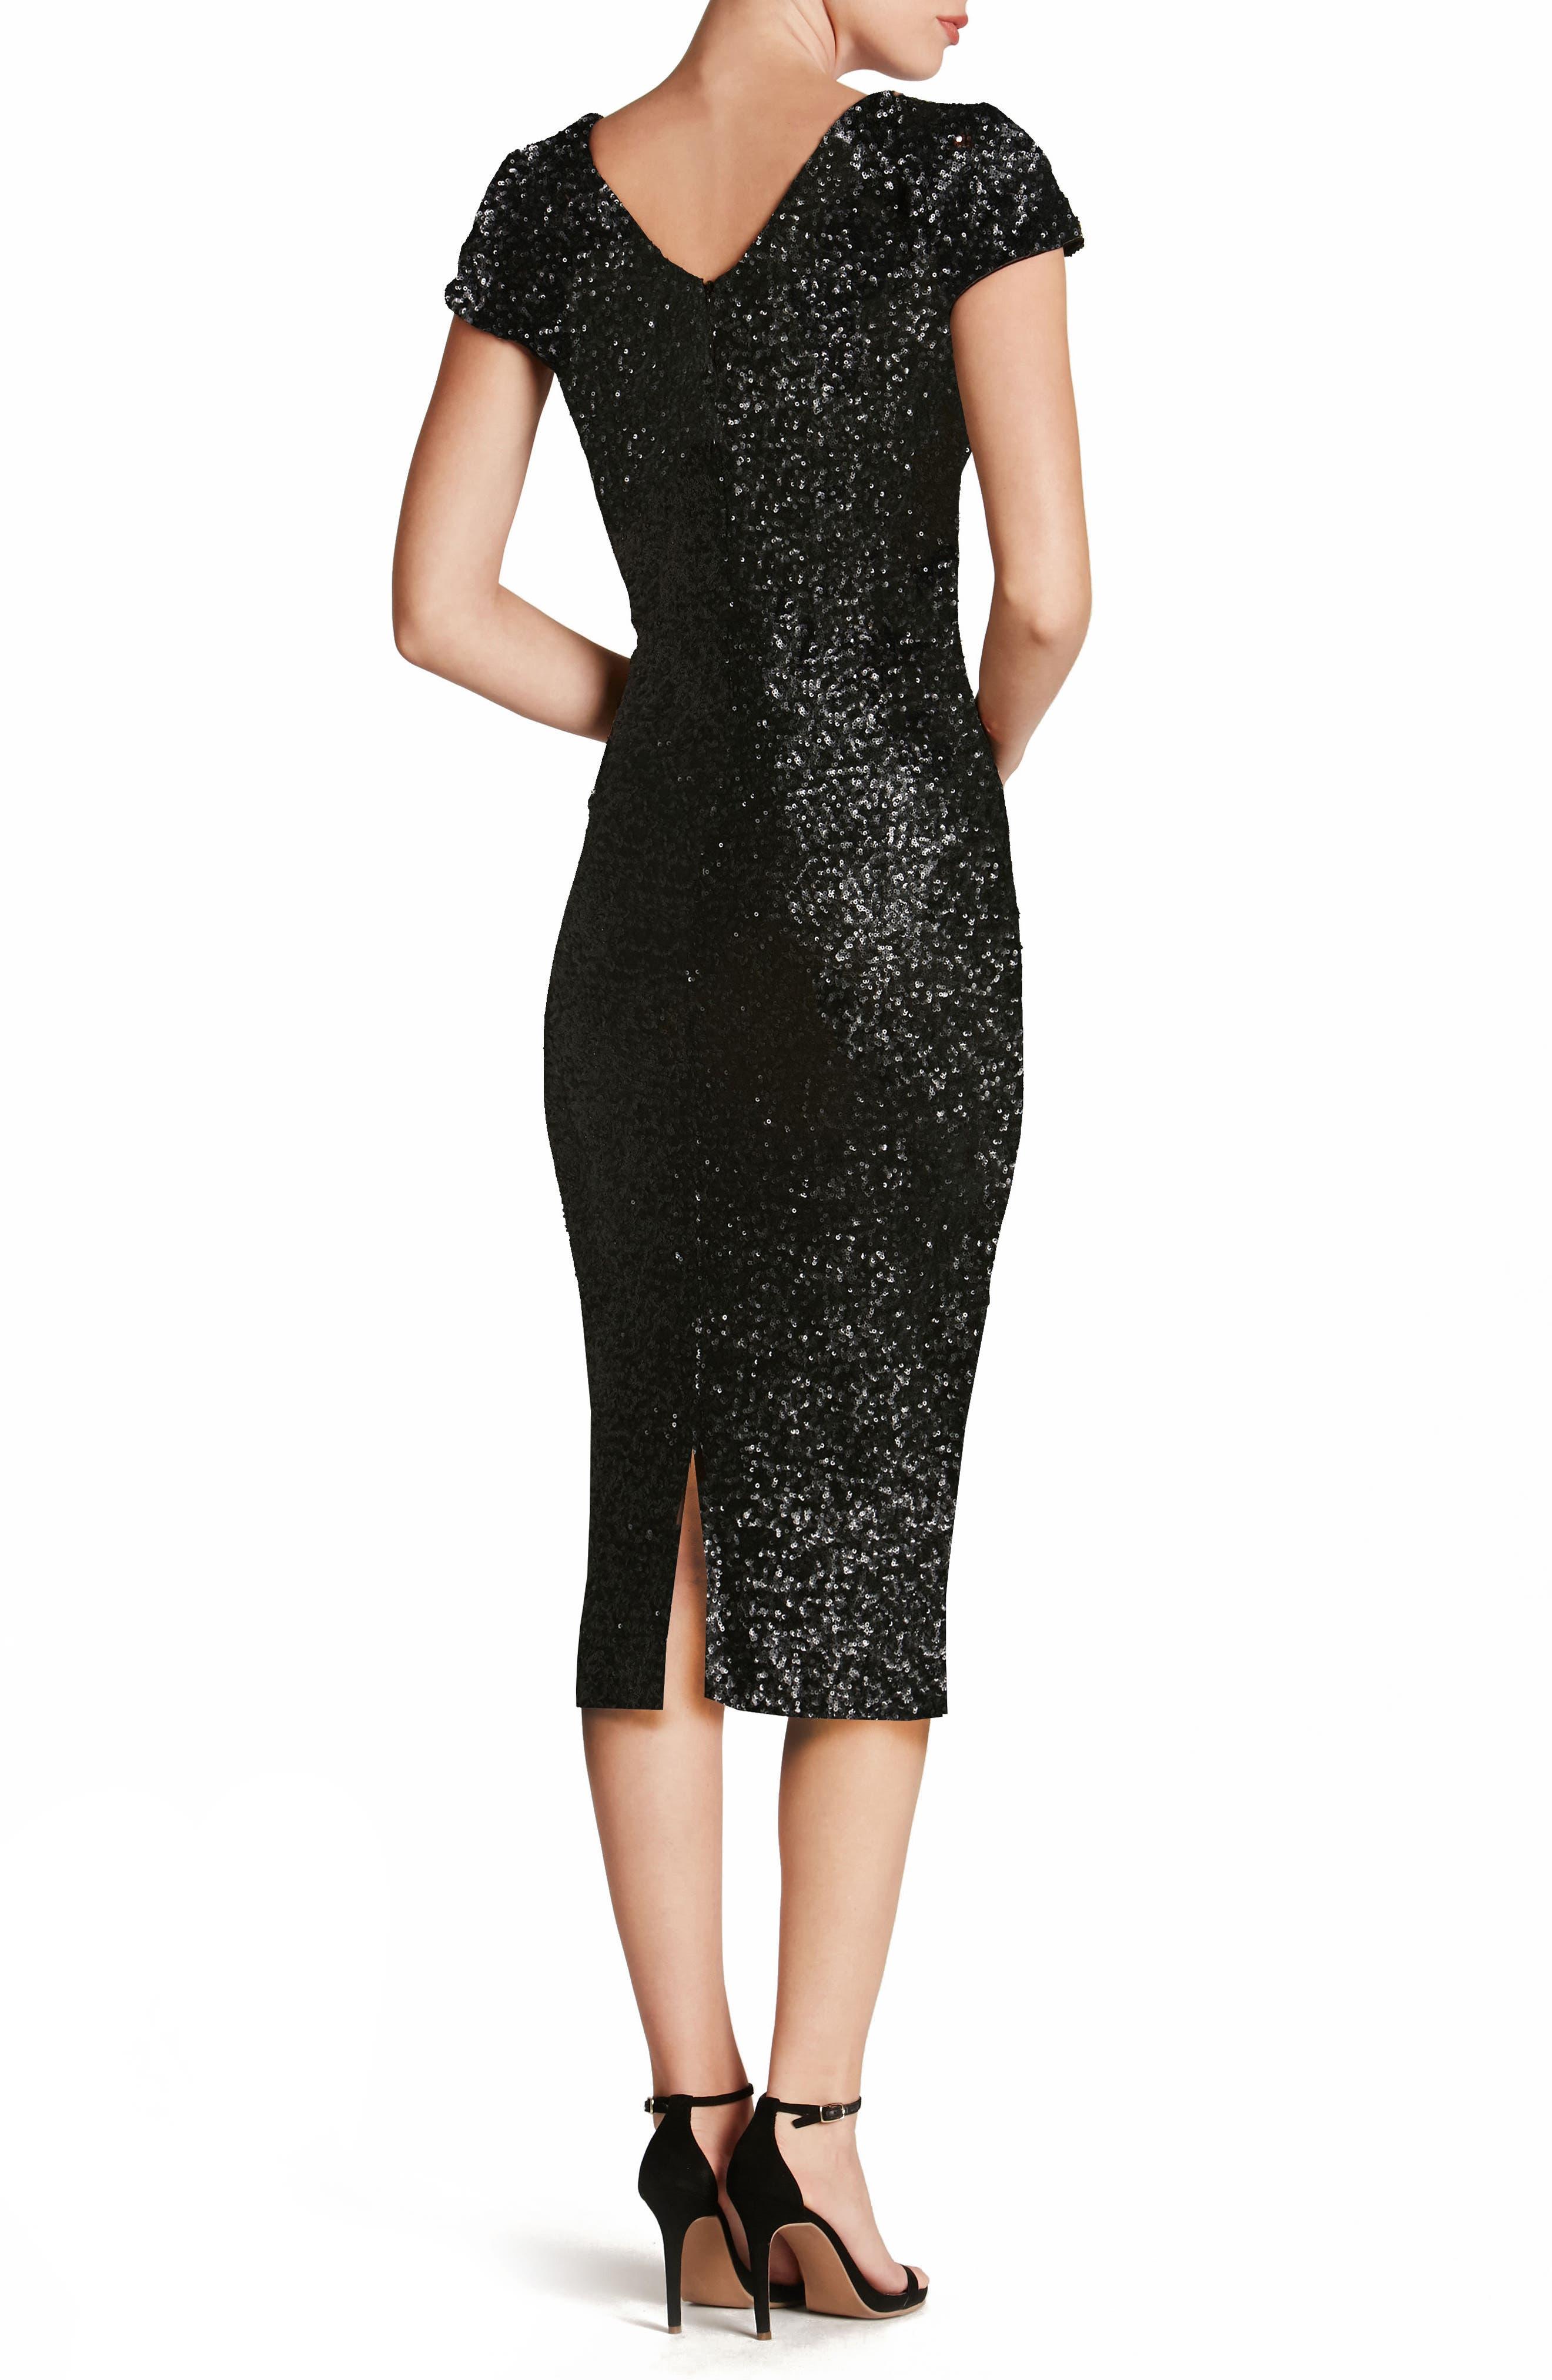 DRESS THE POPULATION,                             Allison Sequin Sheath Dress,                             Alternate thumbnail 2, color,                             008